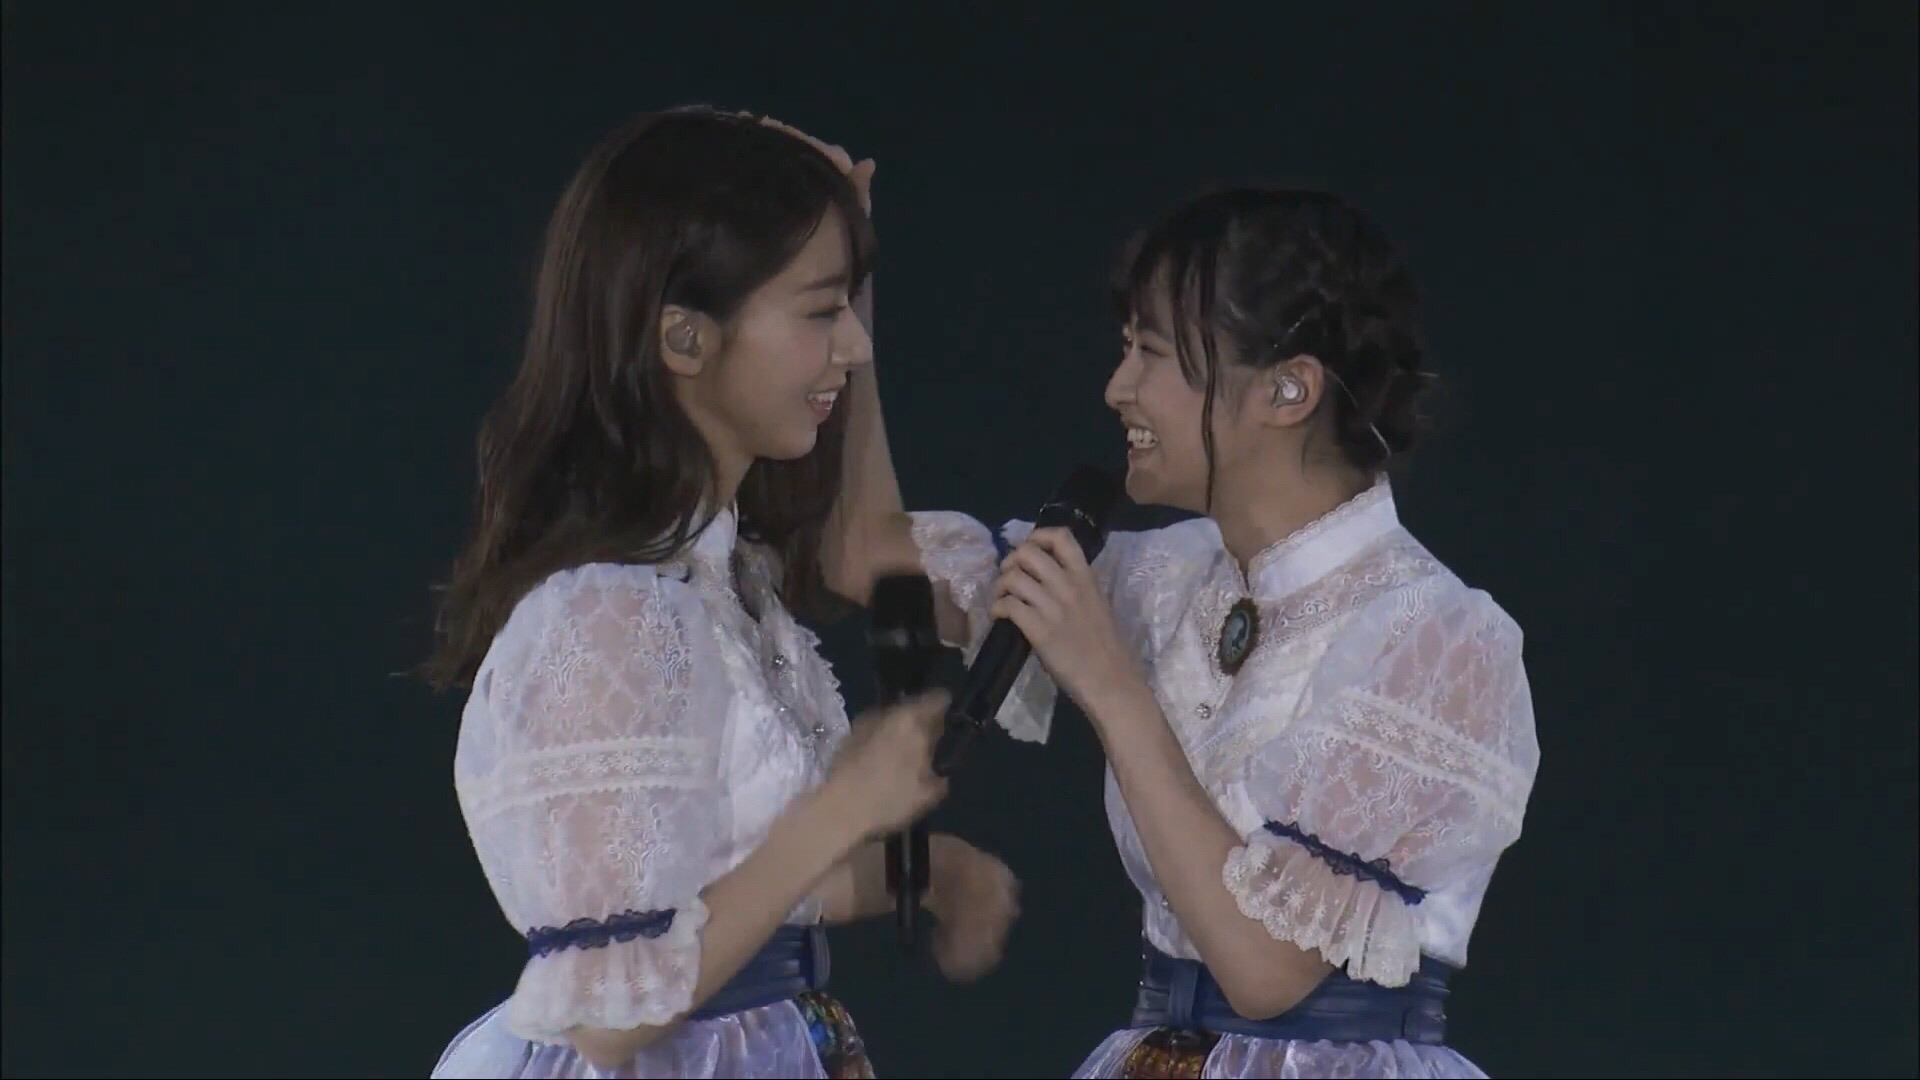 乃木坂46 5th YEAR BIRTHDAY LIVE Blu-ray&DVD CM